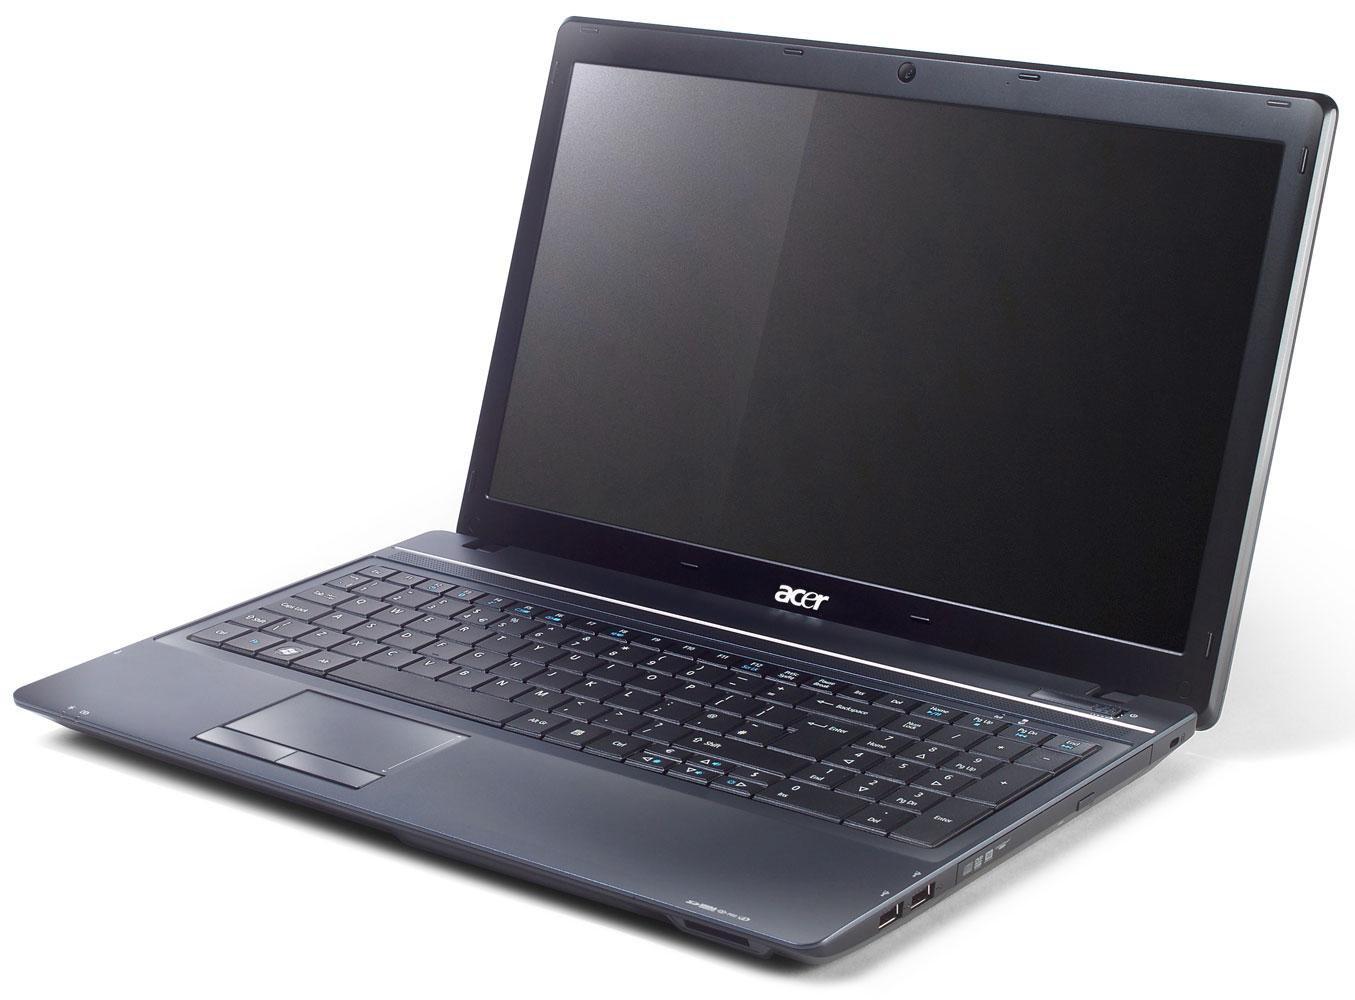 Acer TravelMate 52454G50Mnsk - Ordenador portátil (Negro, Concha, i5-2450M, Intel Core i5-2xxx, Smart Cache, Intel HM65 Express): Amazon.es: Informática